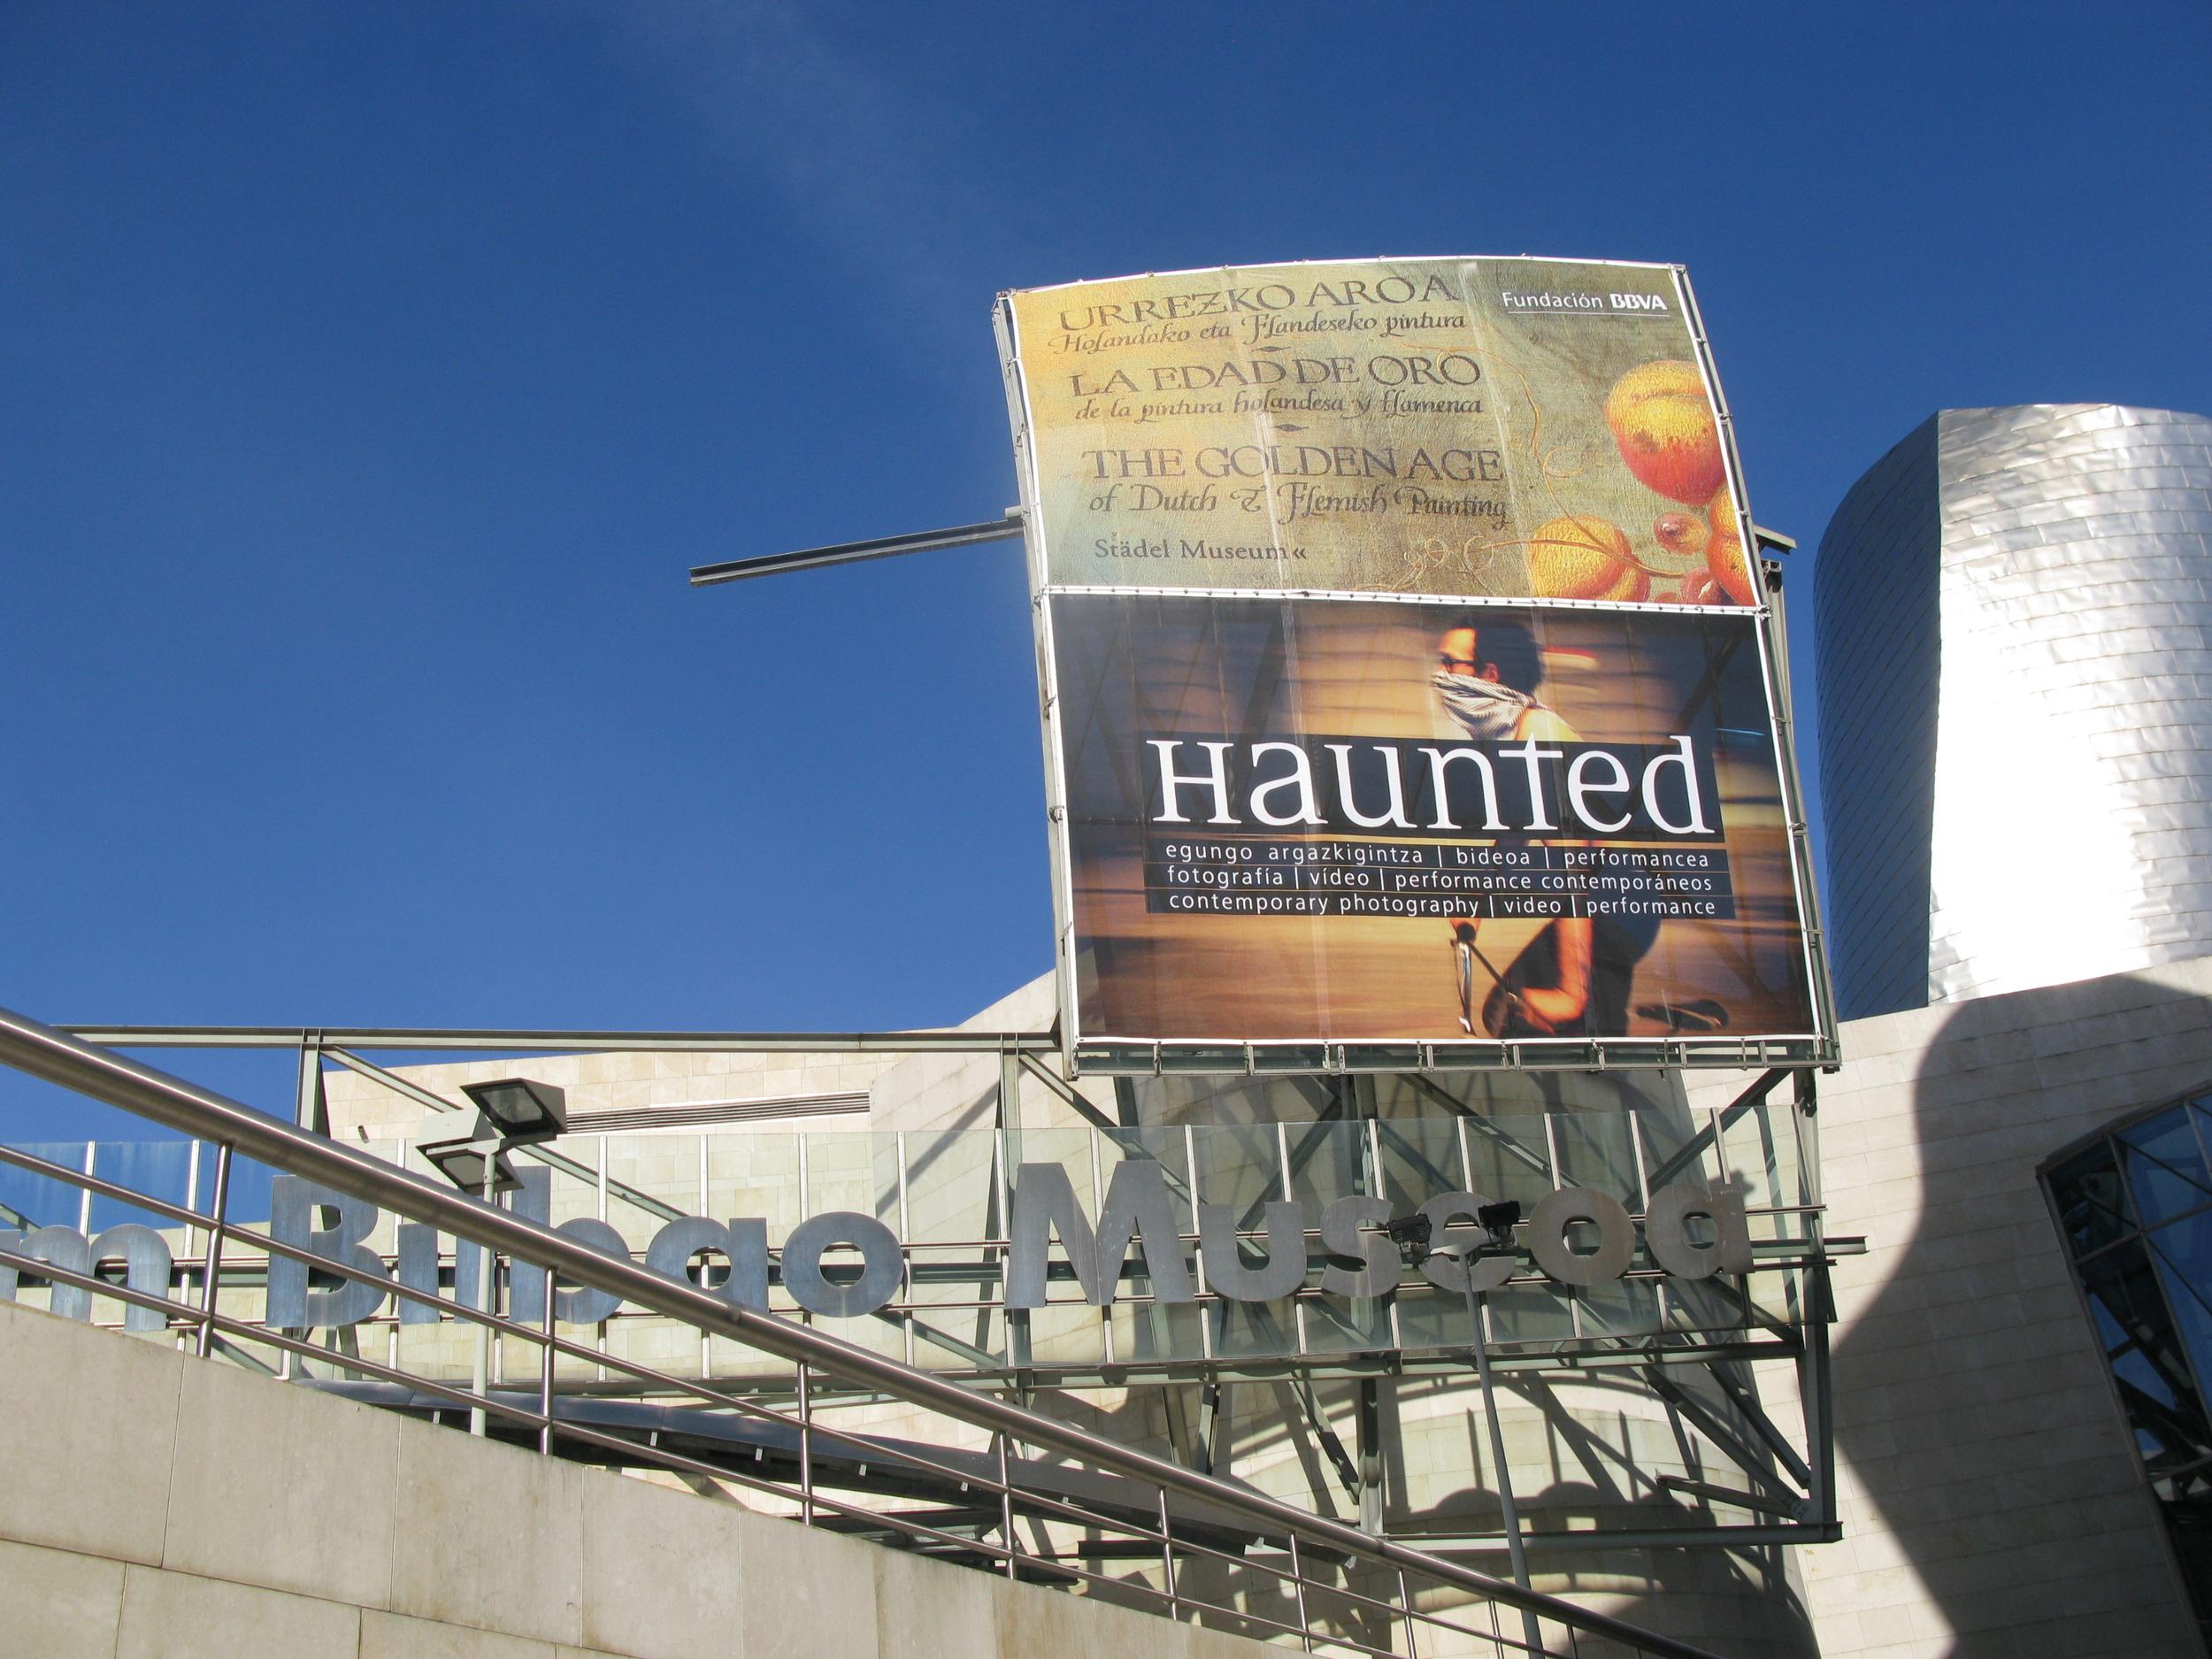 Haunted: Contemporary Photography / Video / Performance    Guggenheim  Museum Bilbao, Bilbao, Spain, 2010